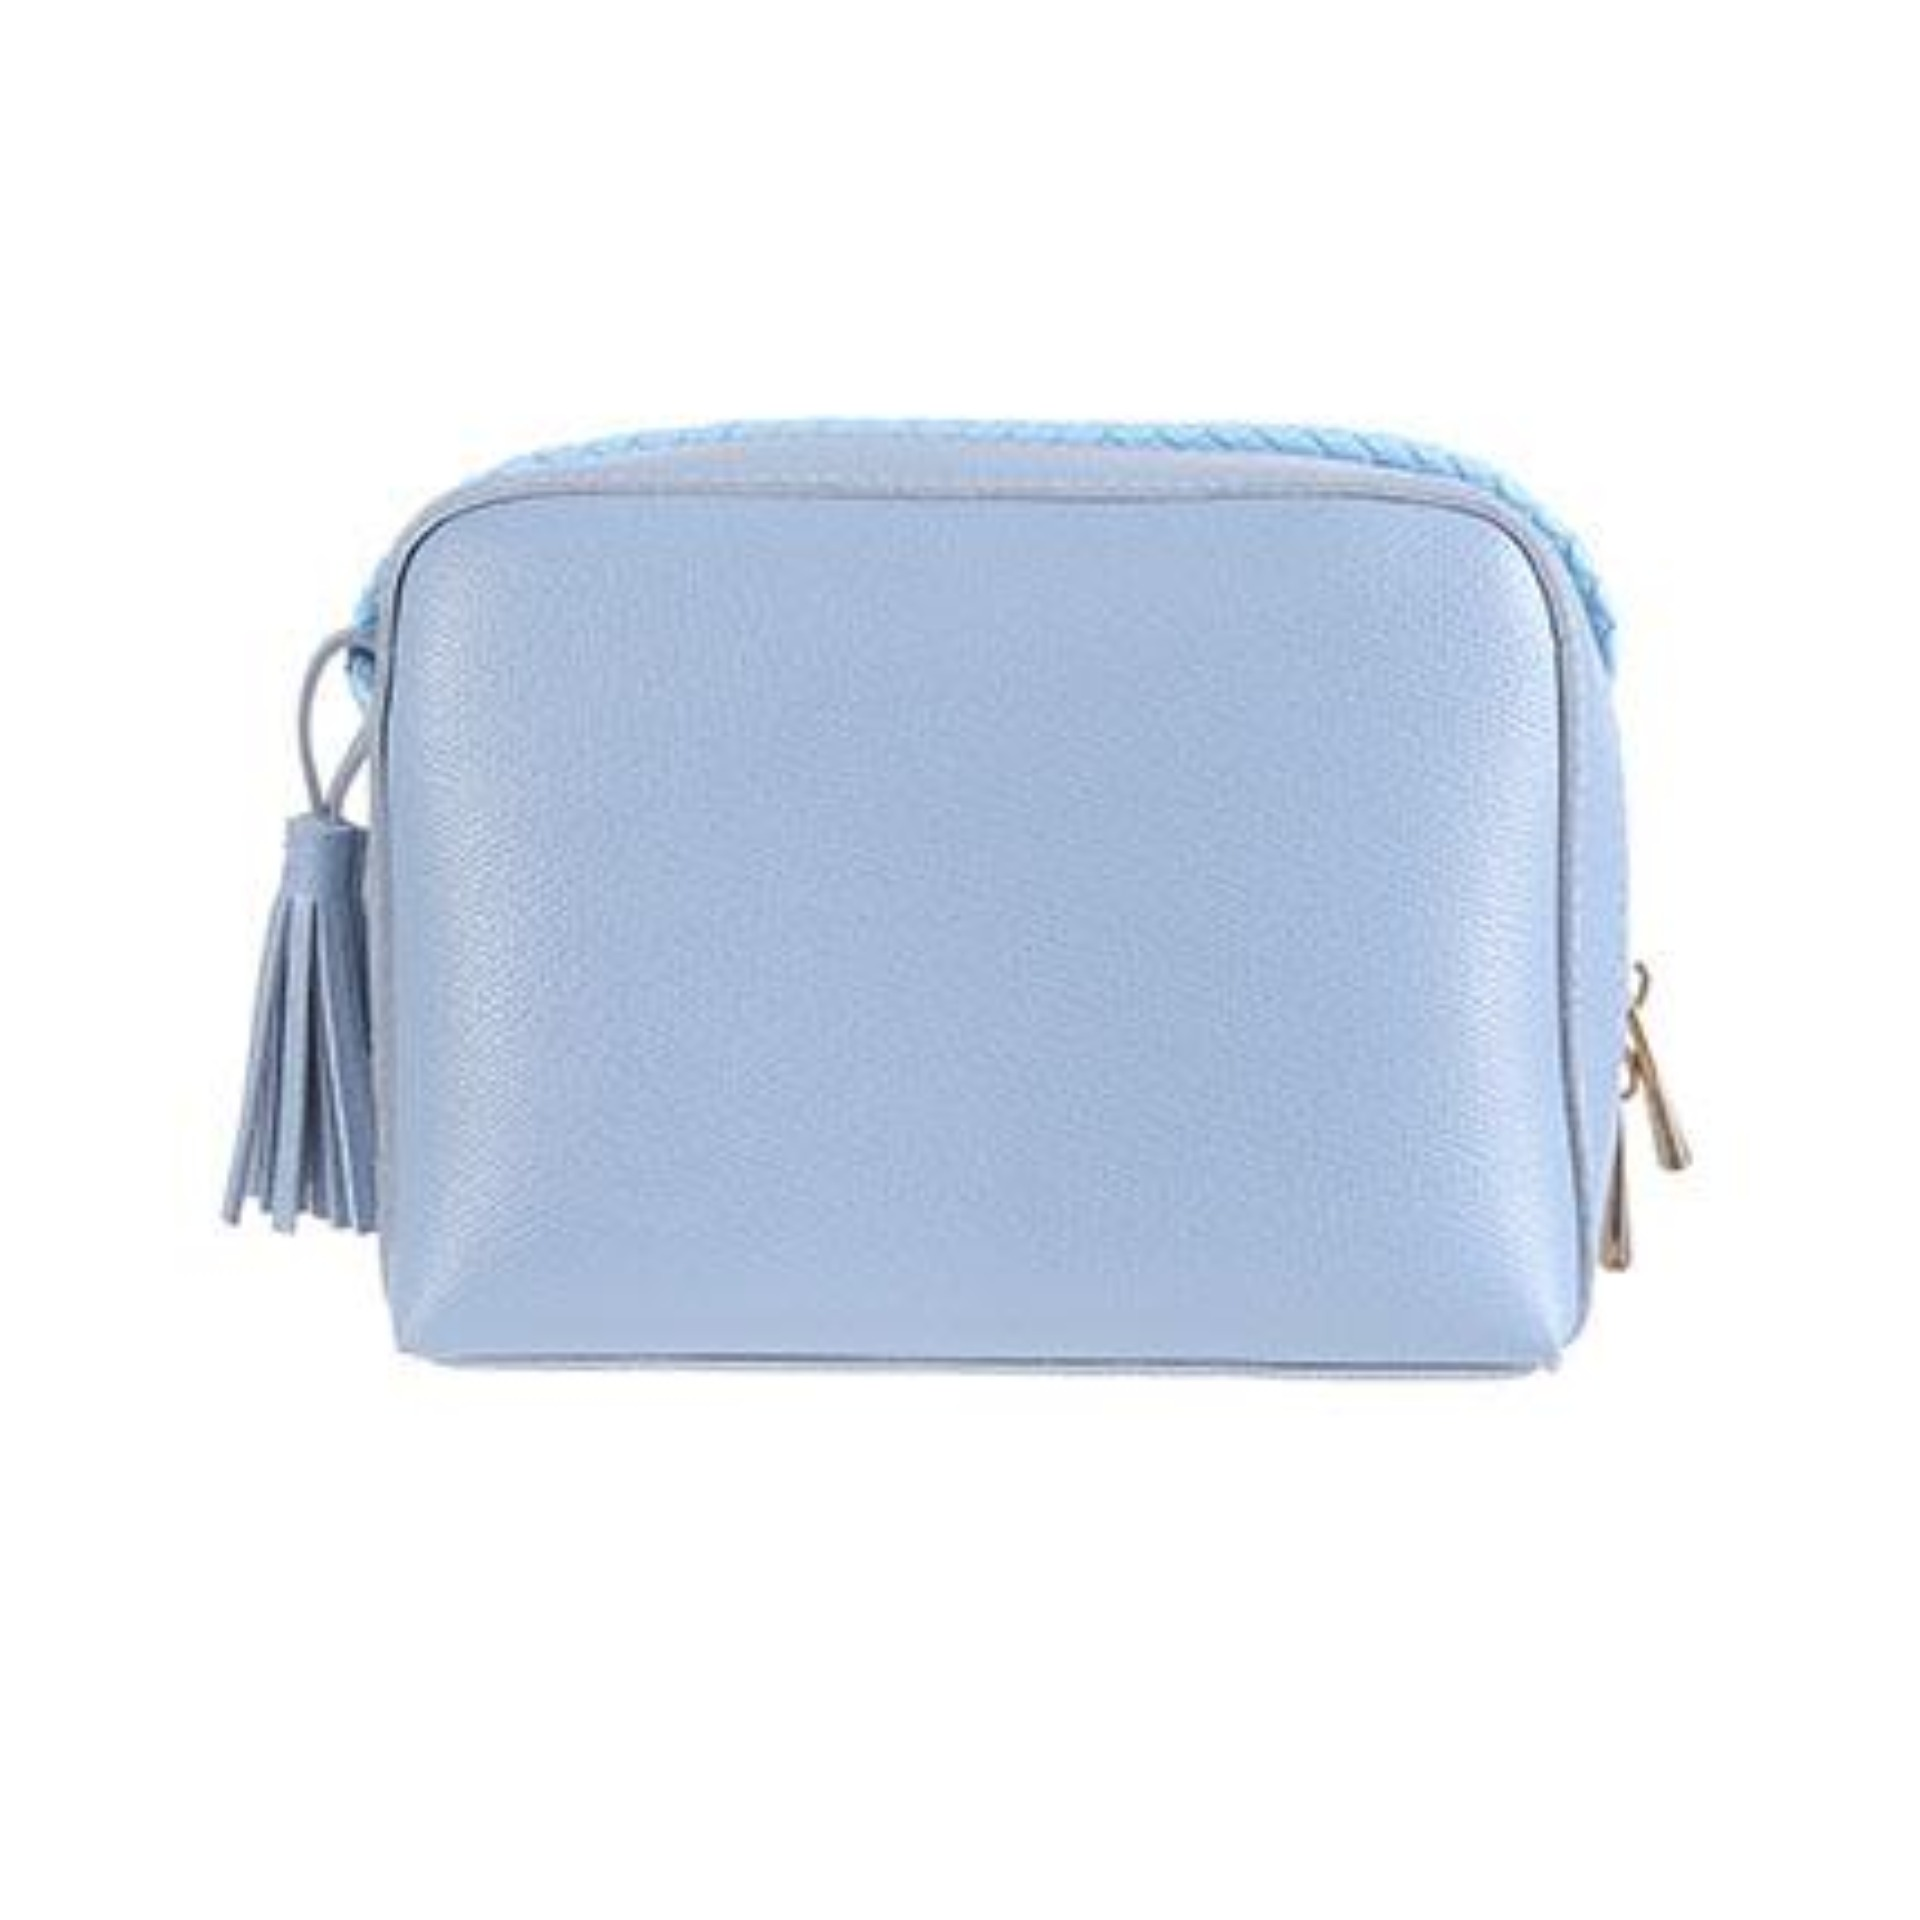 Miniso Tas Selempang Solid Color Rectangle Crossbody Bag Biru